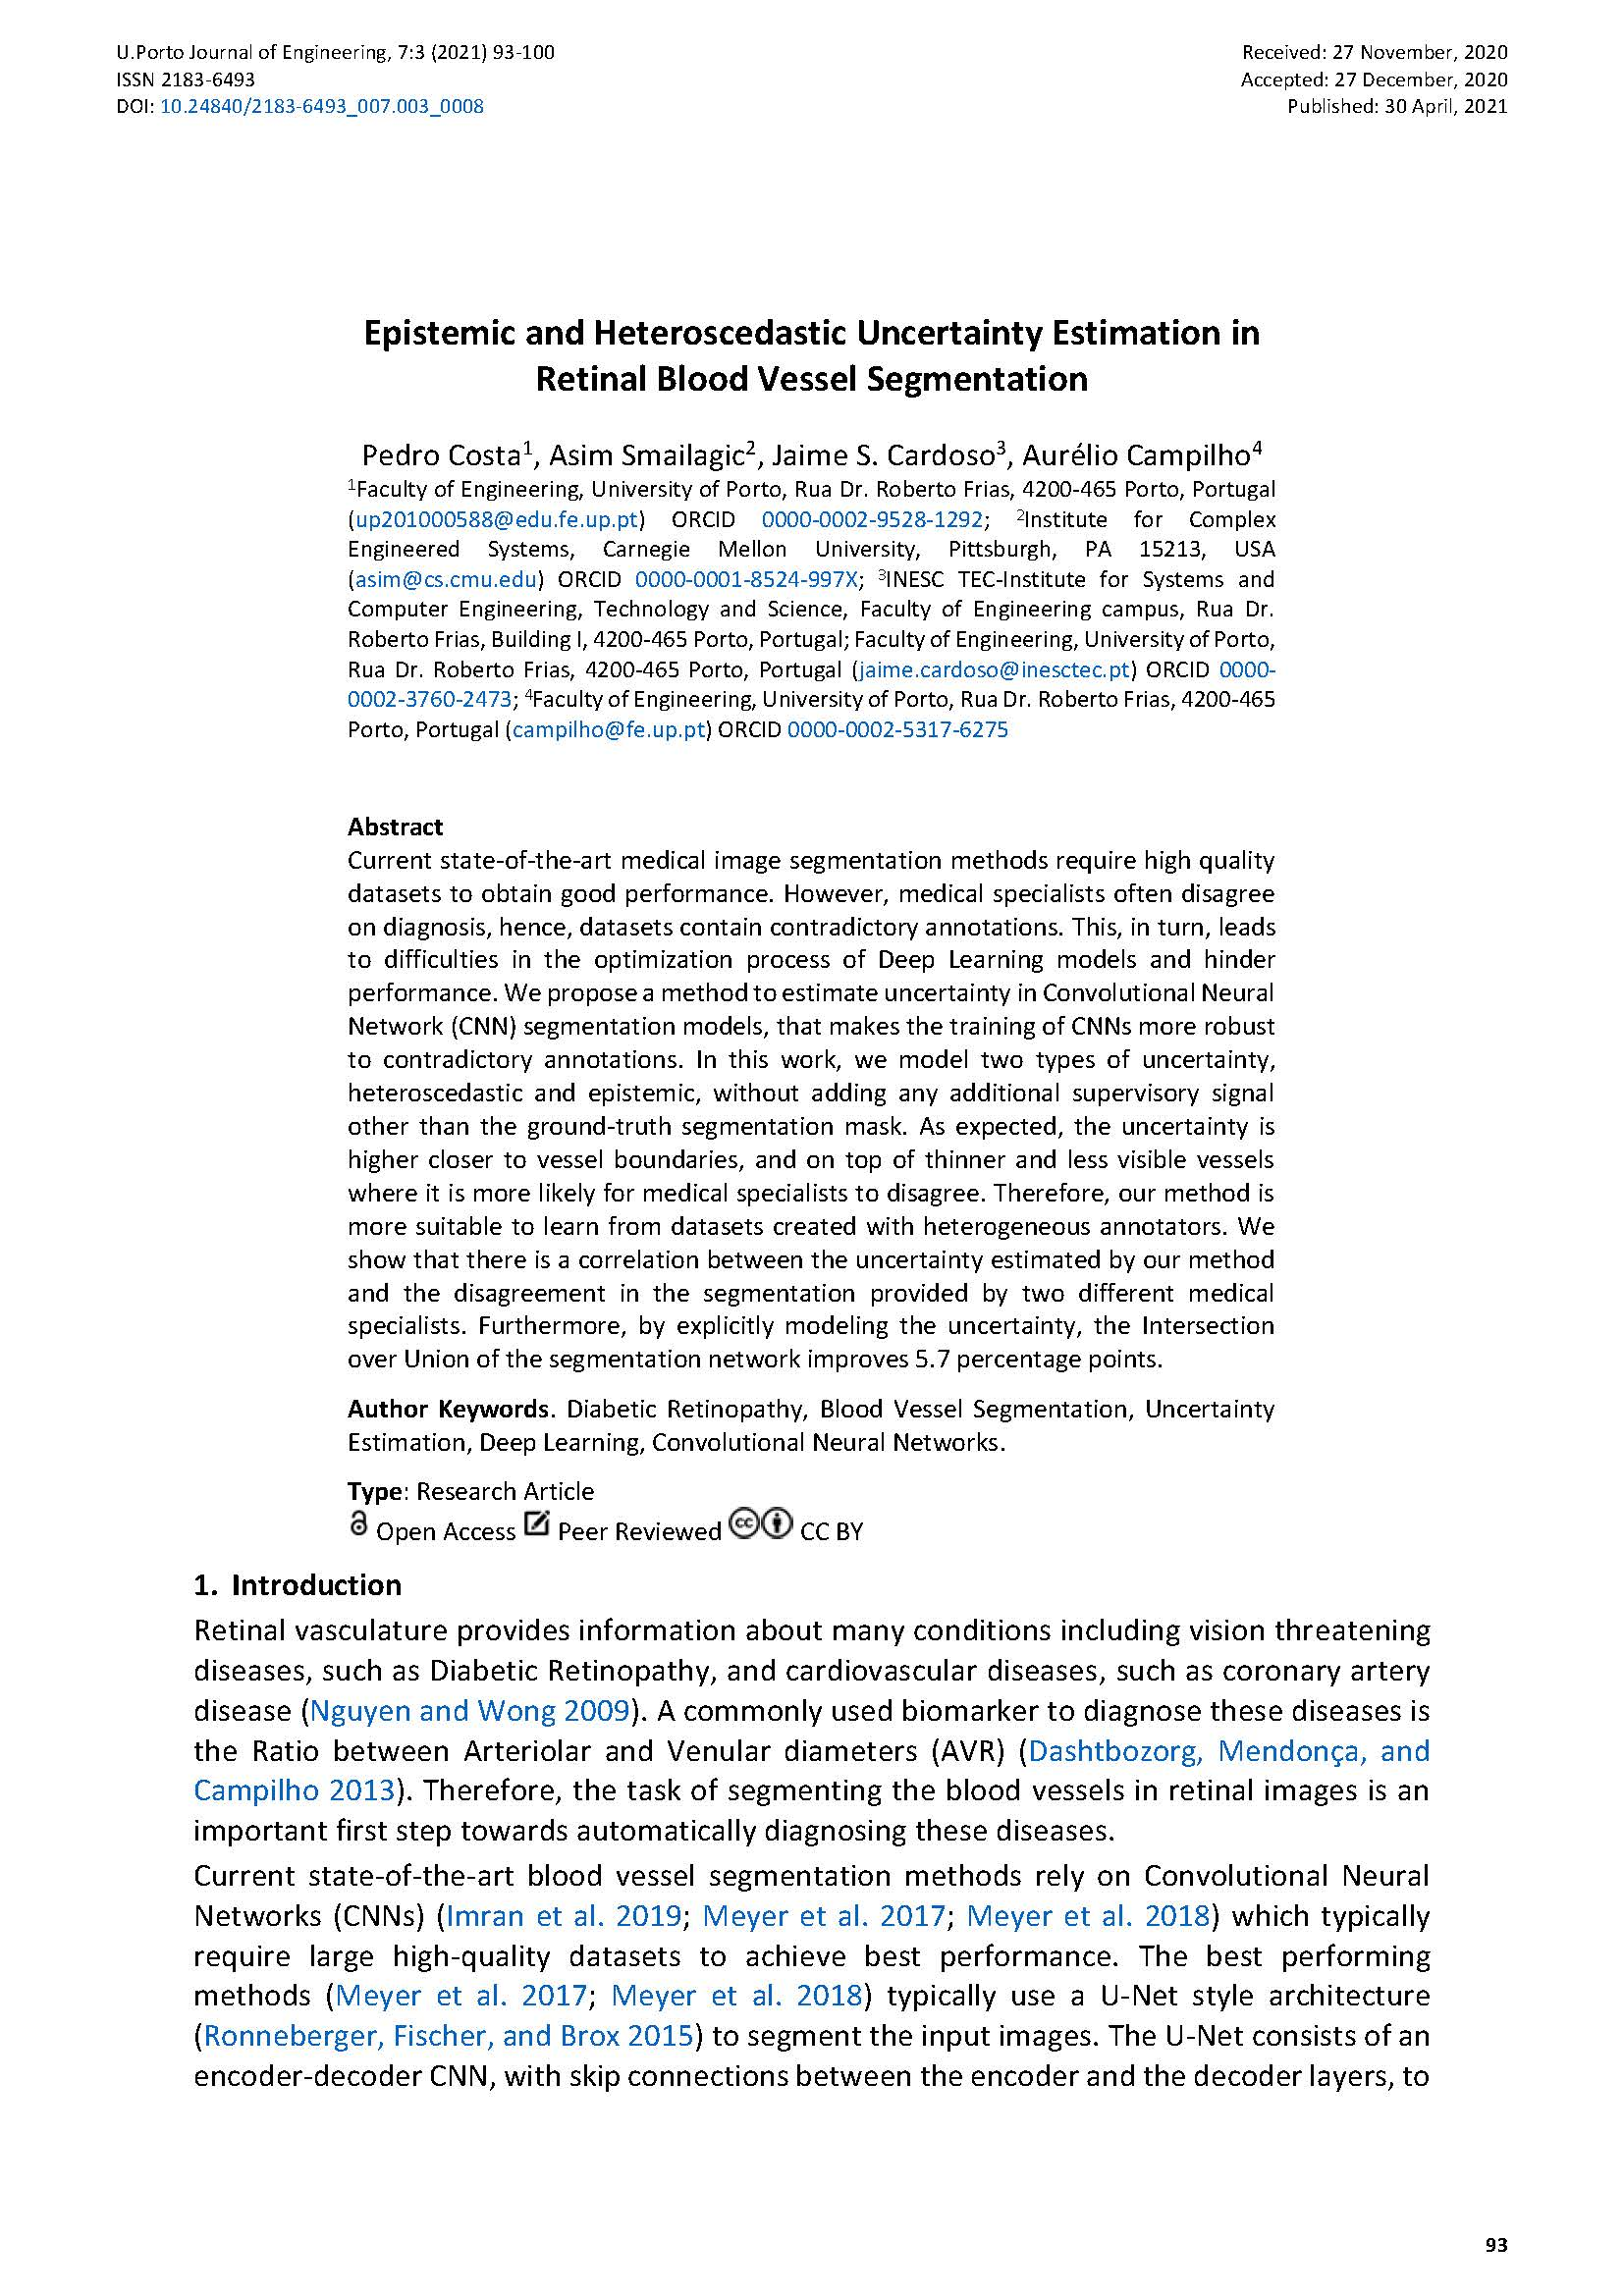 Epistemic and Heteroscedastic Uncertainty Estimation in Retinal Blood Vessel Segmentation